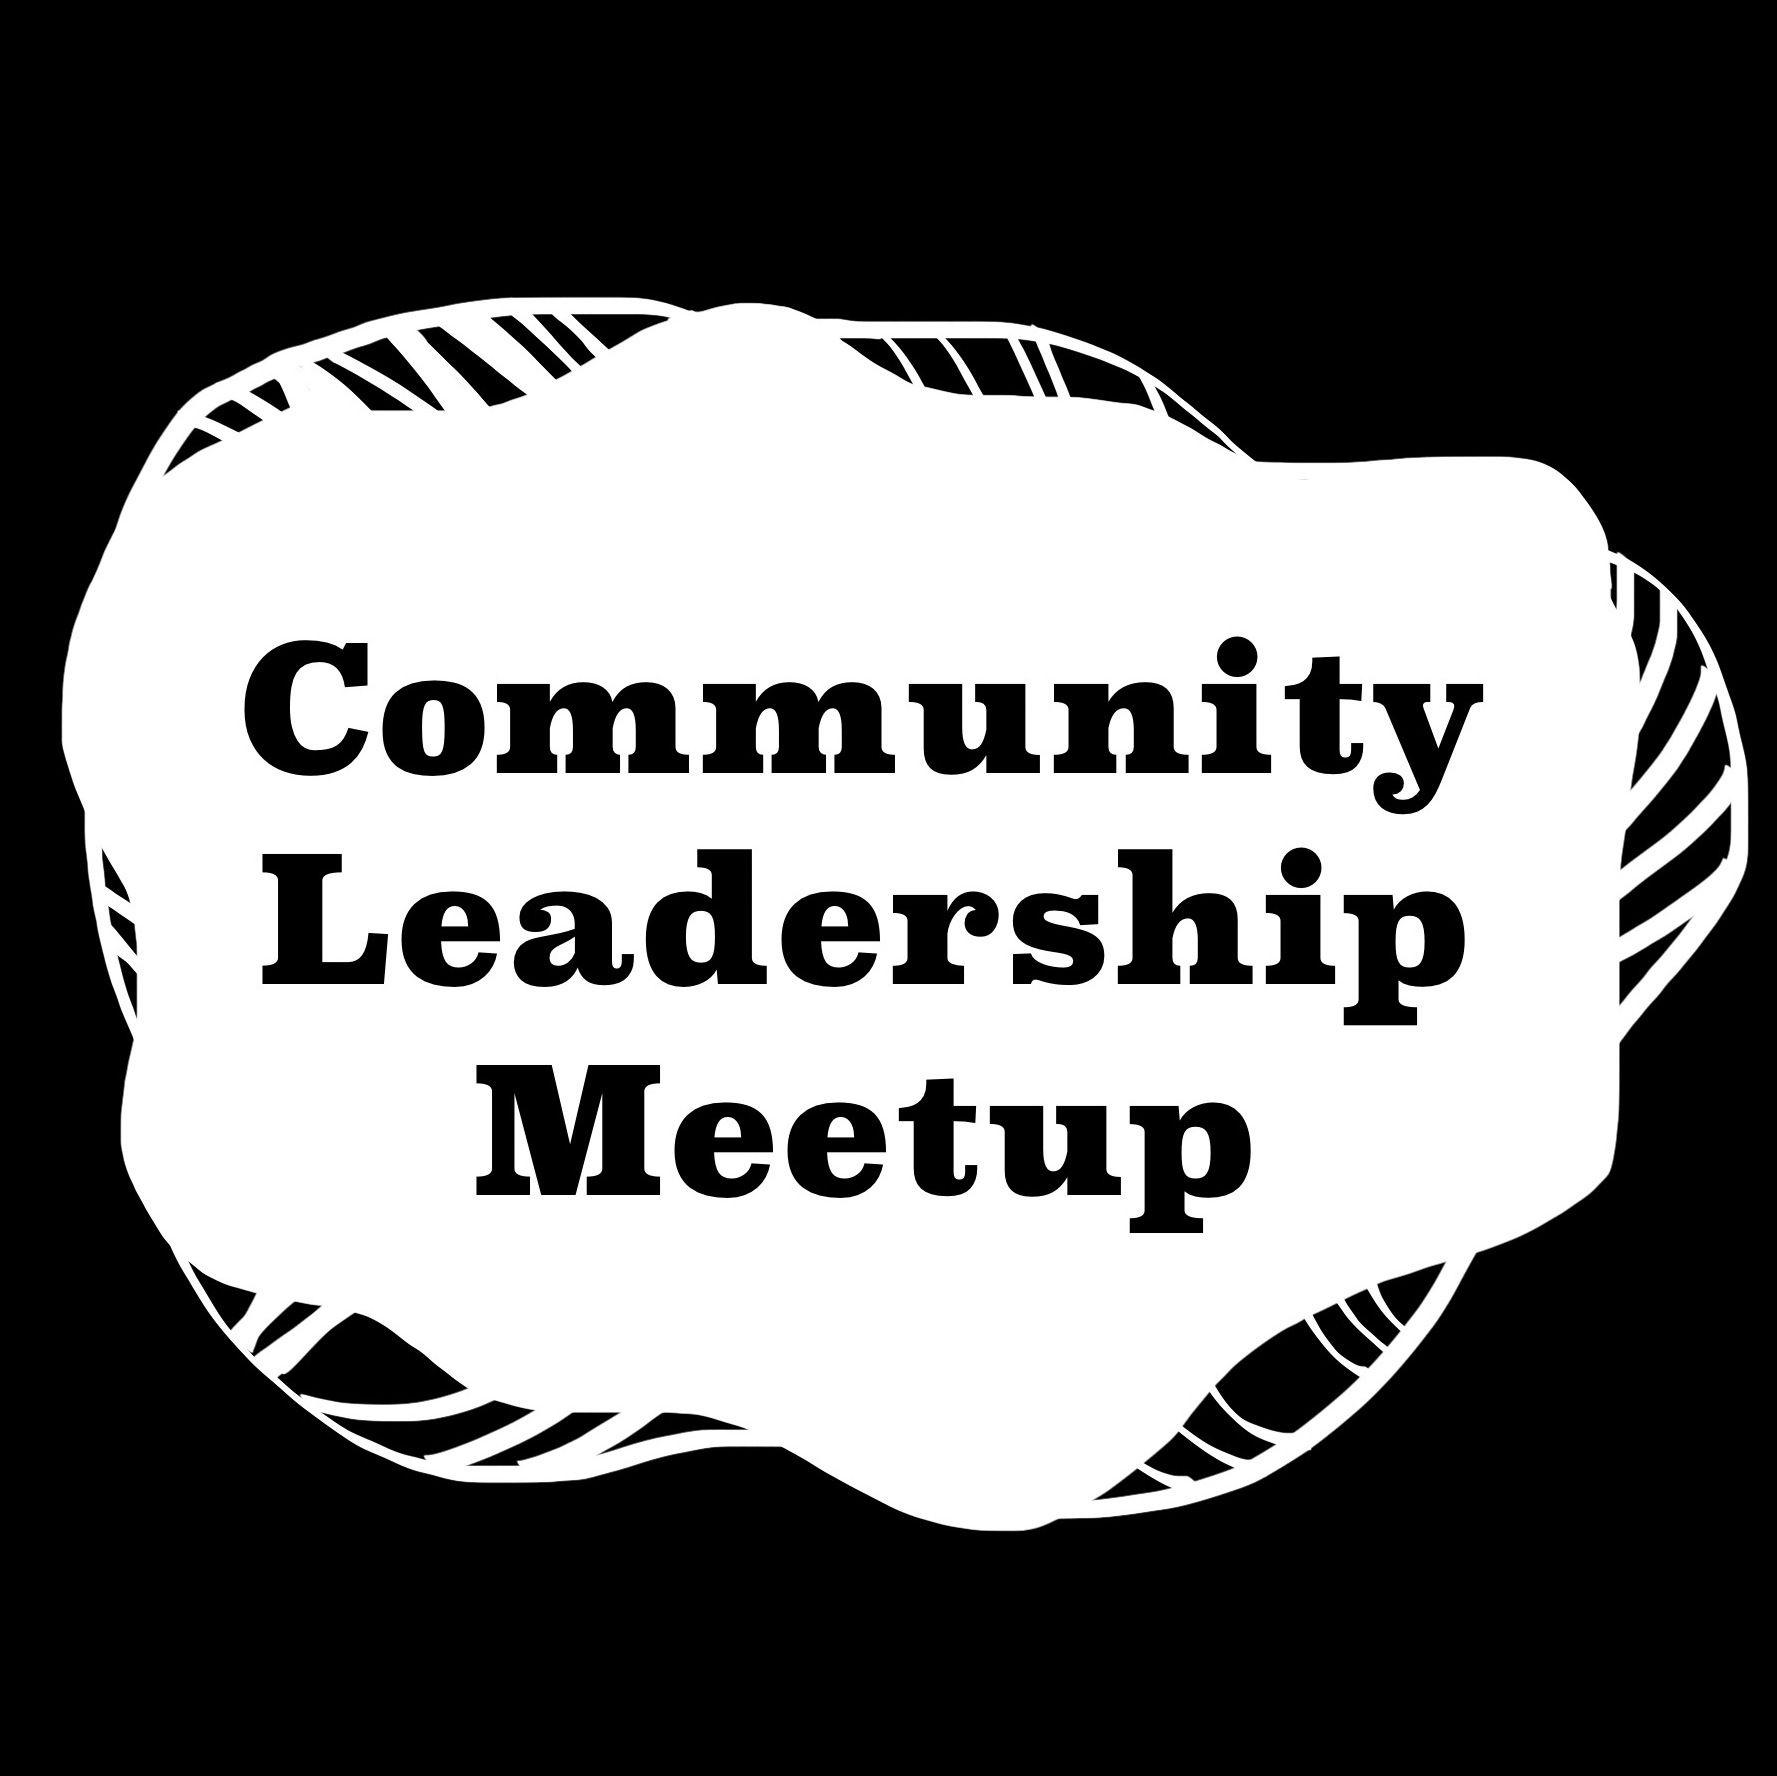 Community Leadership Meetup